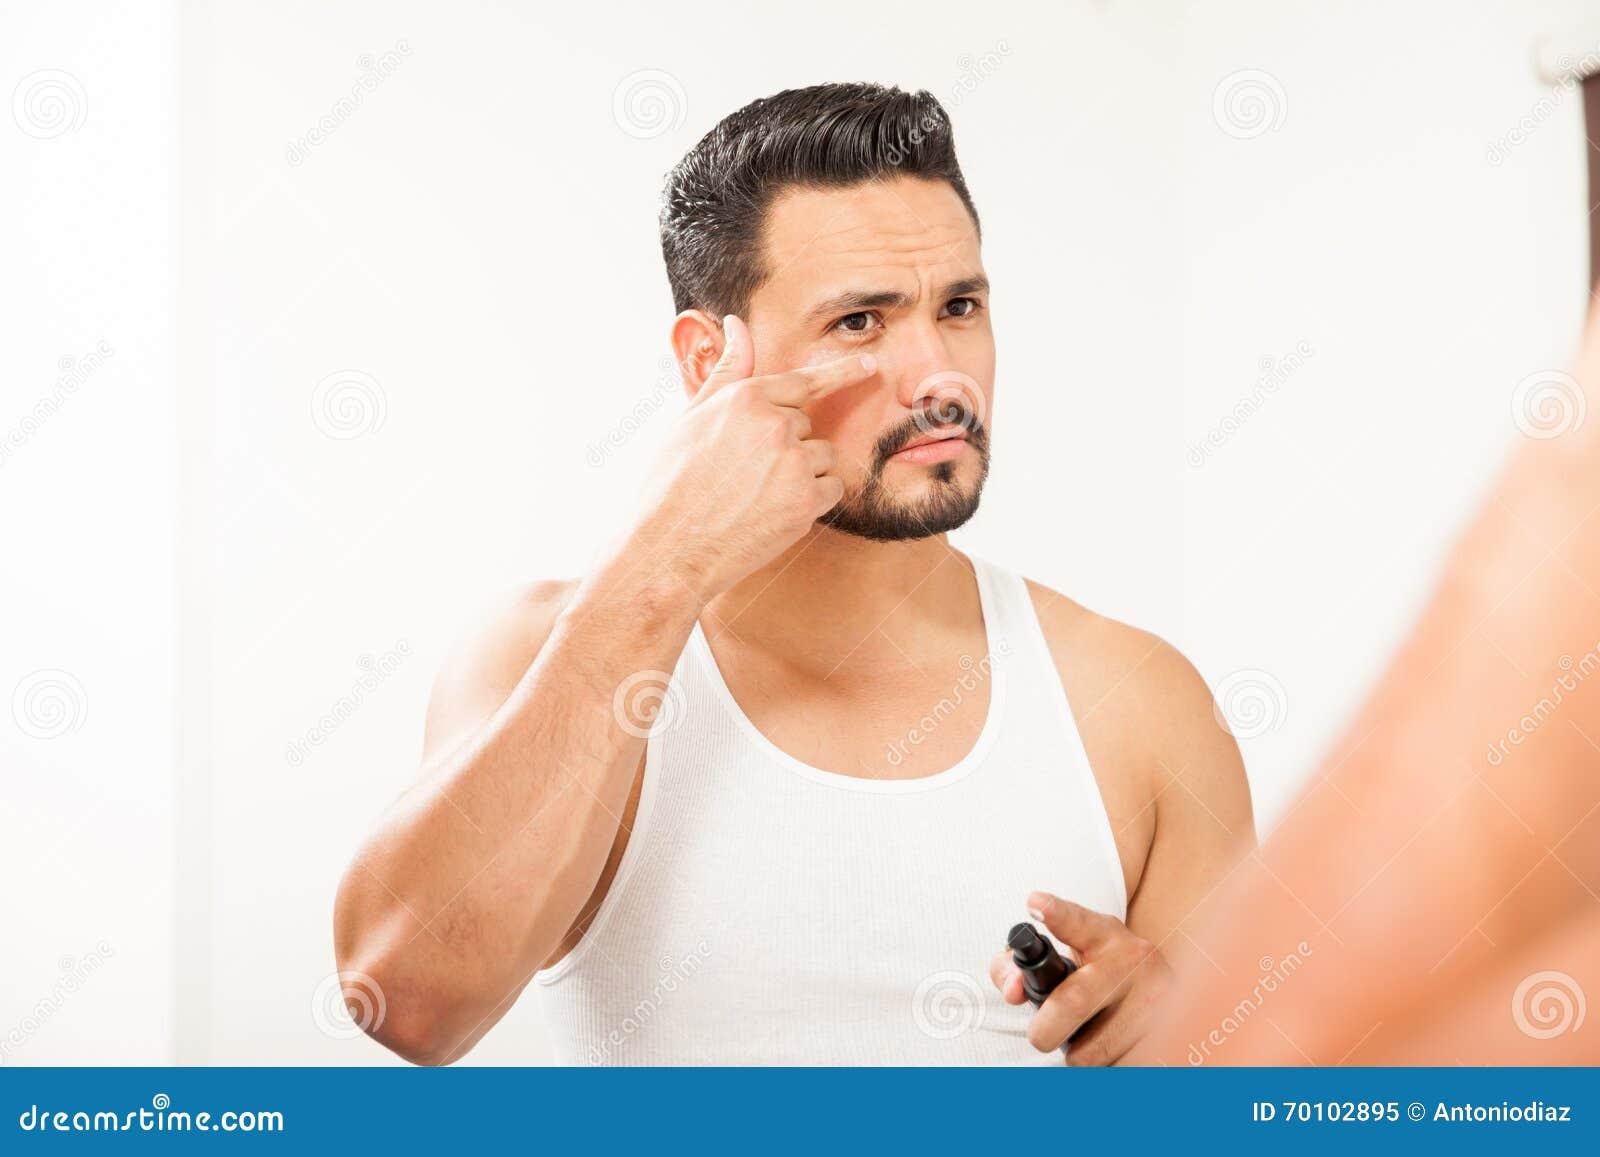 Hispanic Man Using An Under Eye Cream Stock Image - Image of